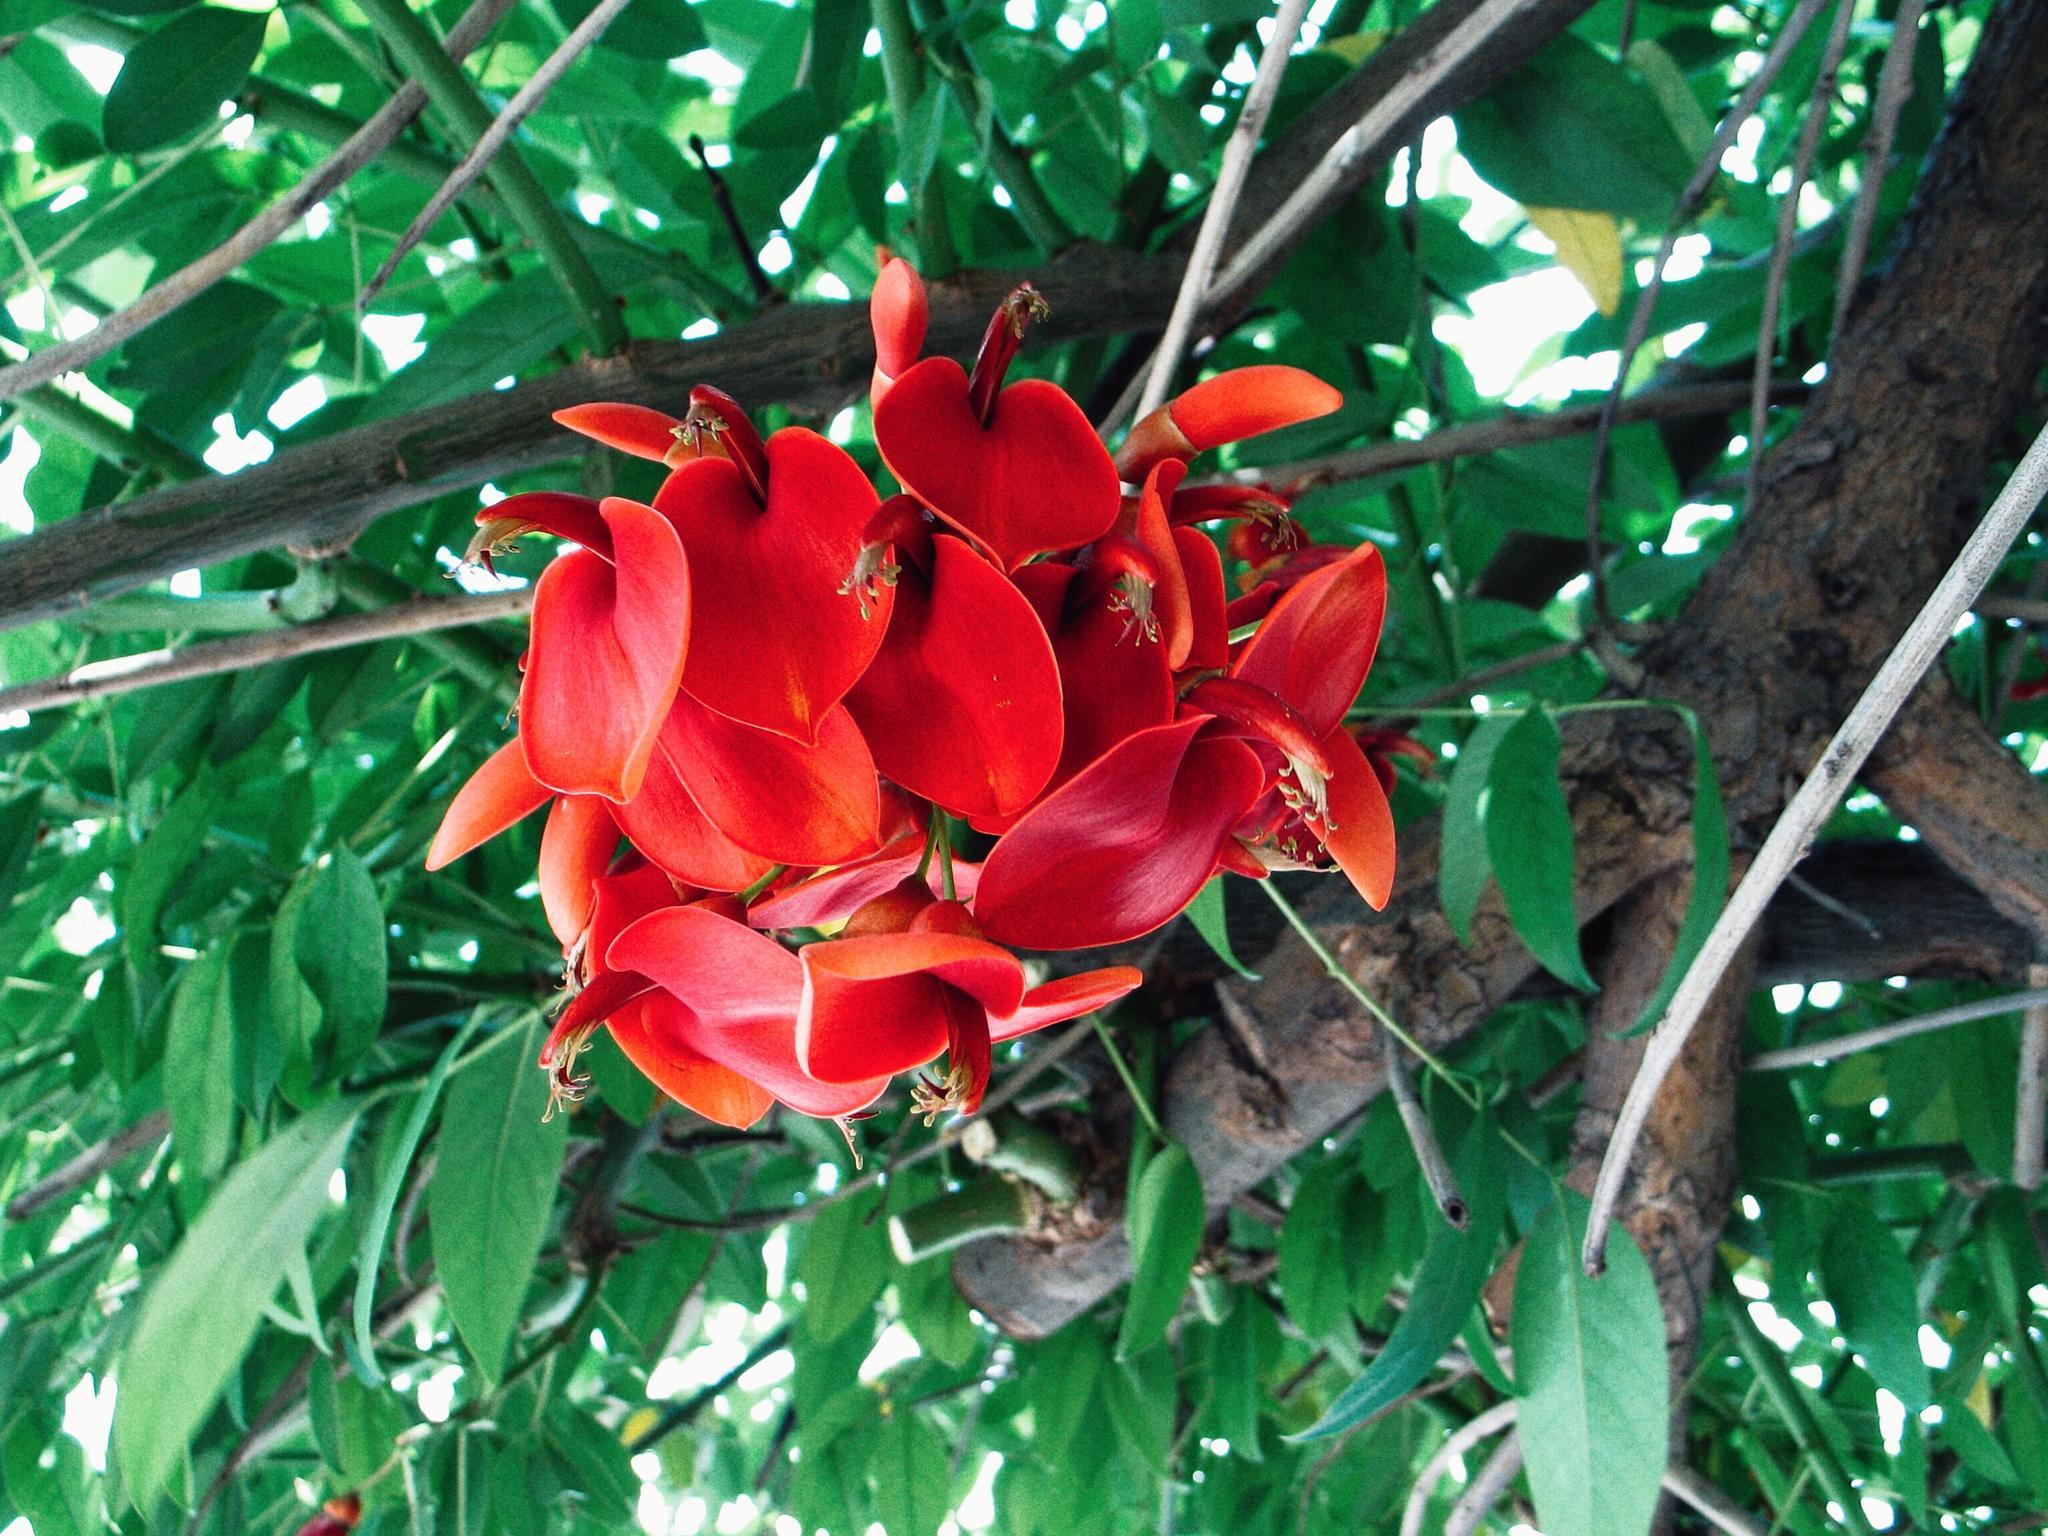 Red flowers in Napoli by Adi Gli